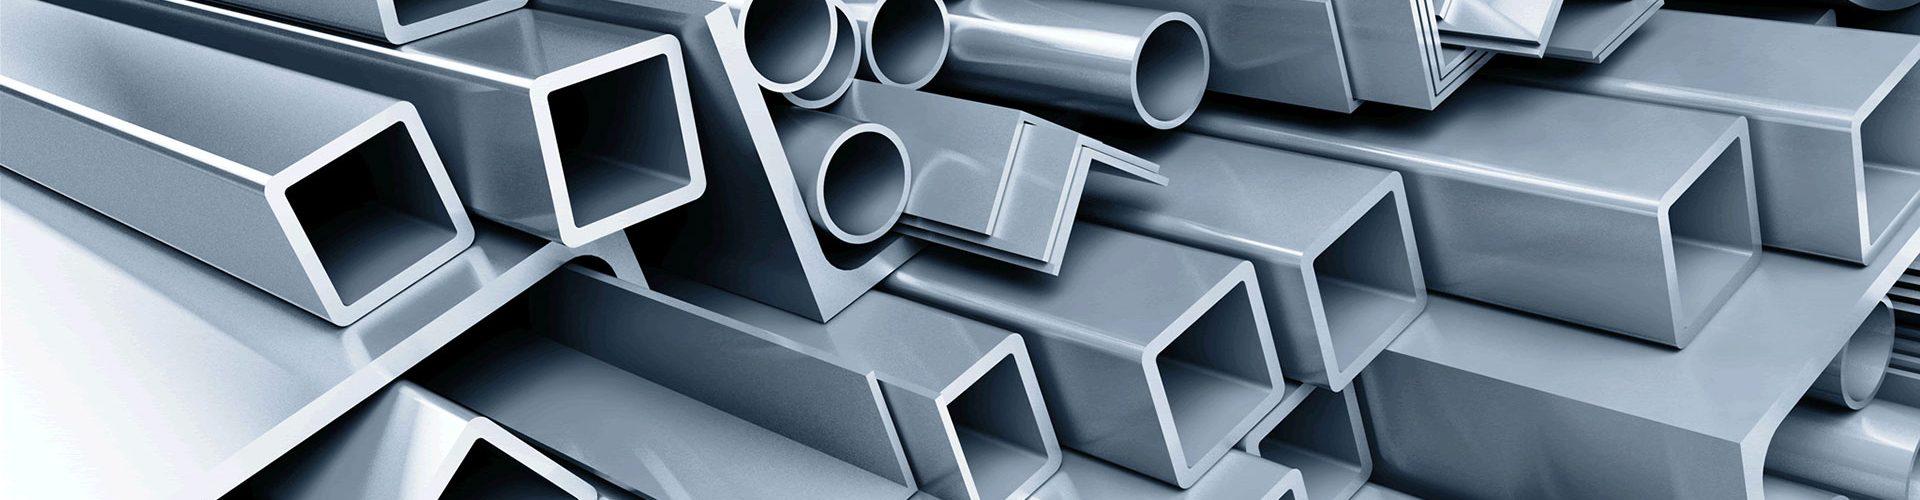 https://hyspex.com.br/wp-content/uploads/2020/05/Tubos-e-Perfis-de-Aluminio-Hyspex-Slide-1-1-1920x500.jpg